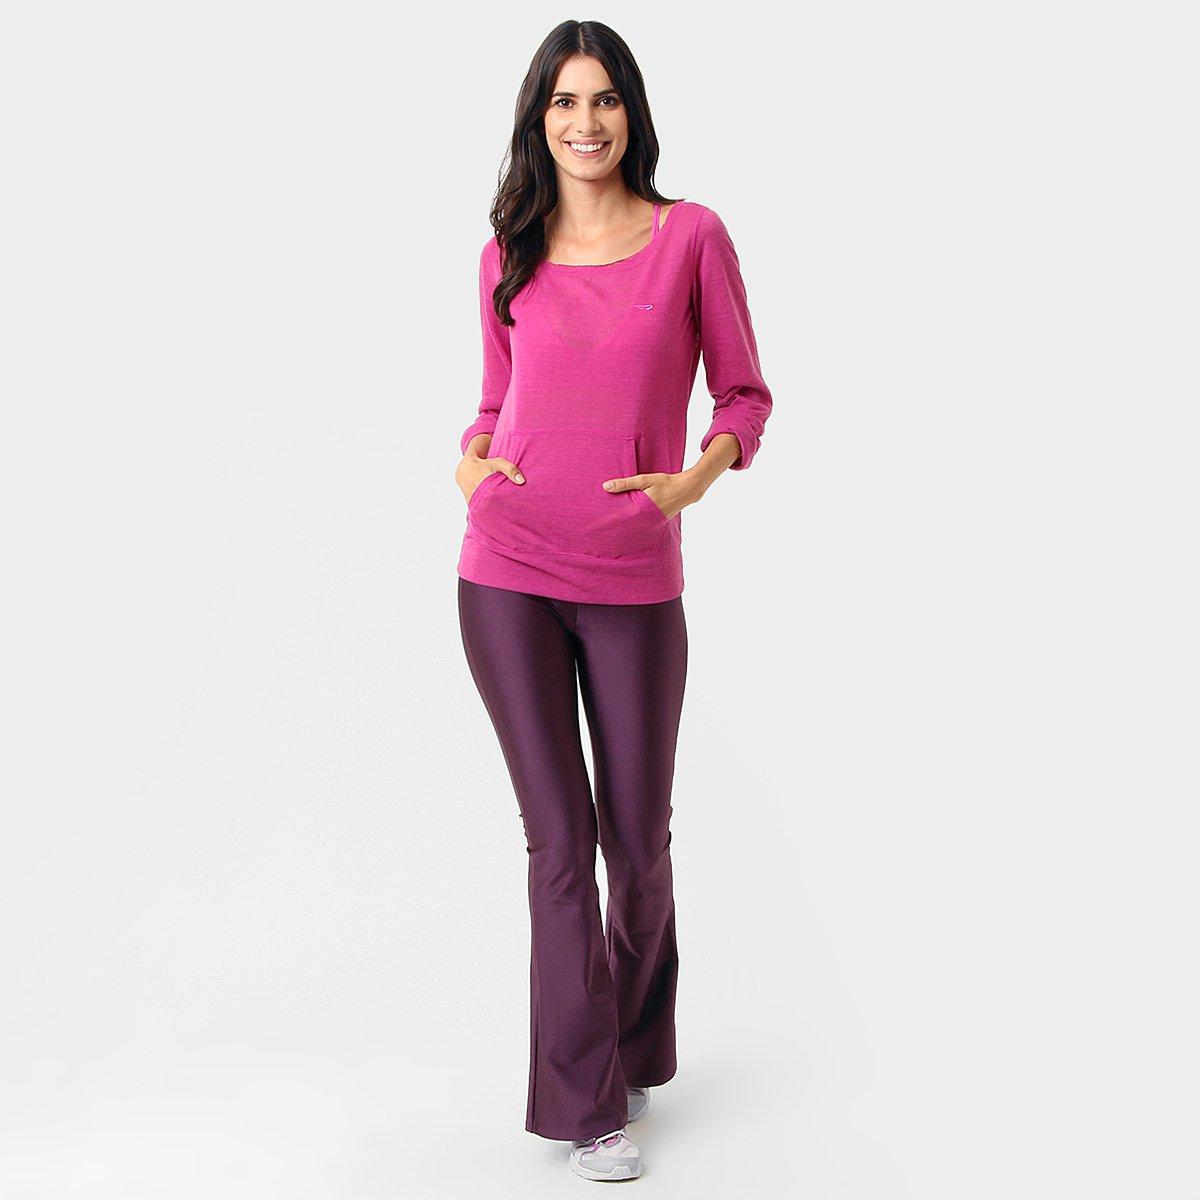 7187bdecd7 Camiseta Rainha Darice M L - Rosa Escuro - Compre Agora